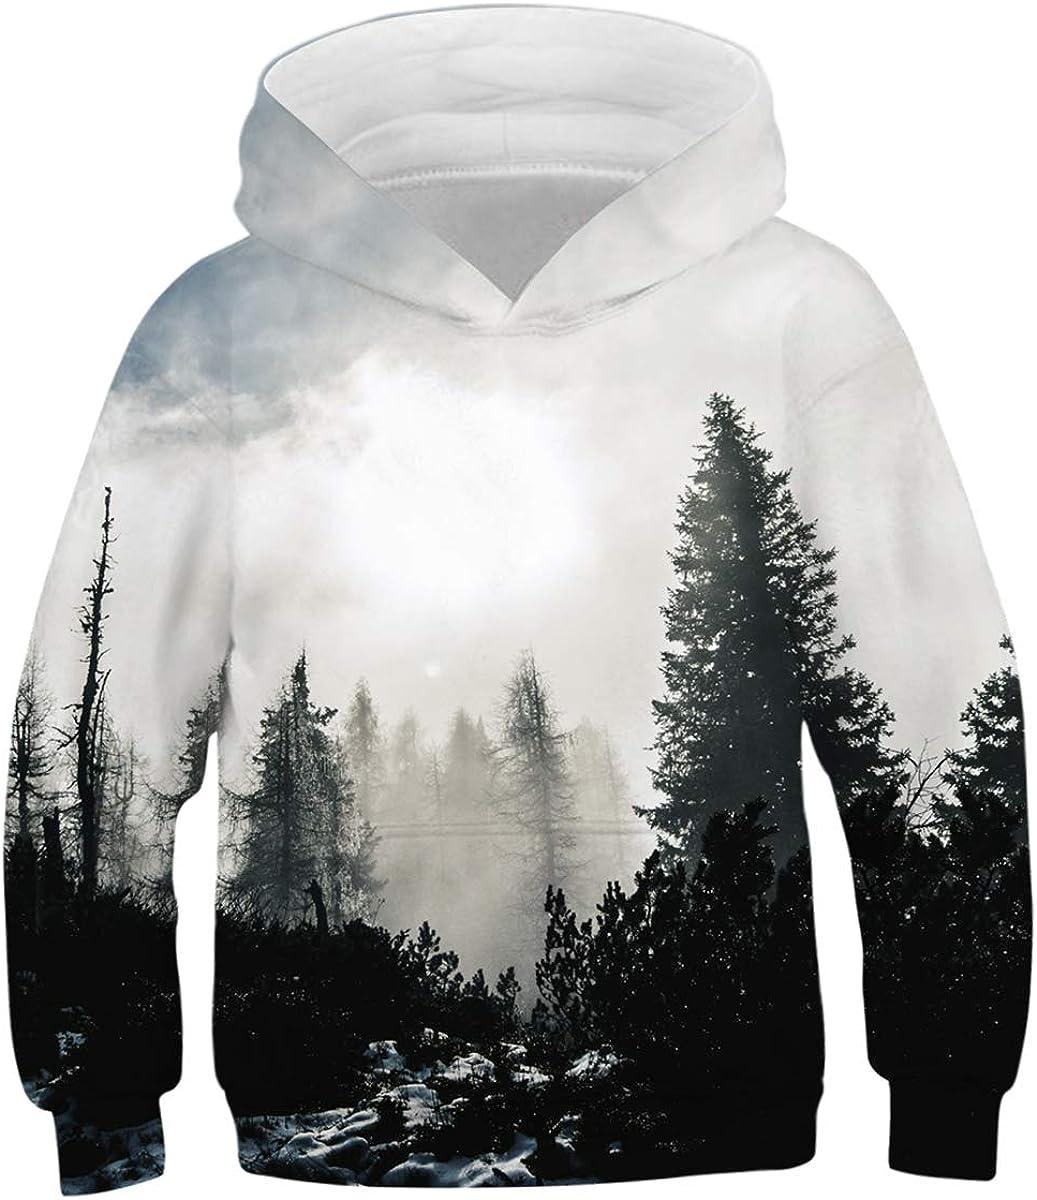 GLUDEAR Boys Girls 3D Print Graphic Sweatshirts Long Sleeve Pullover Hoodies